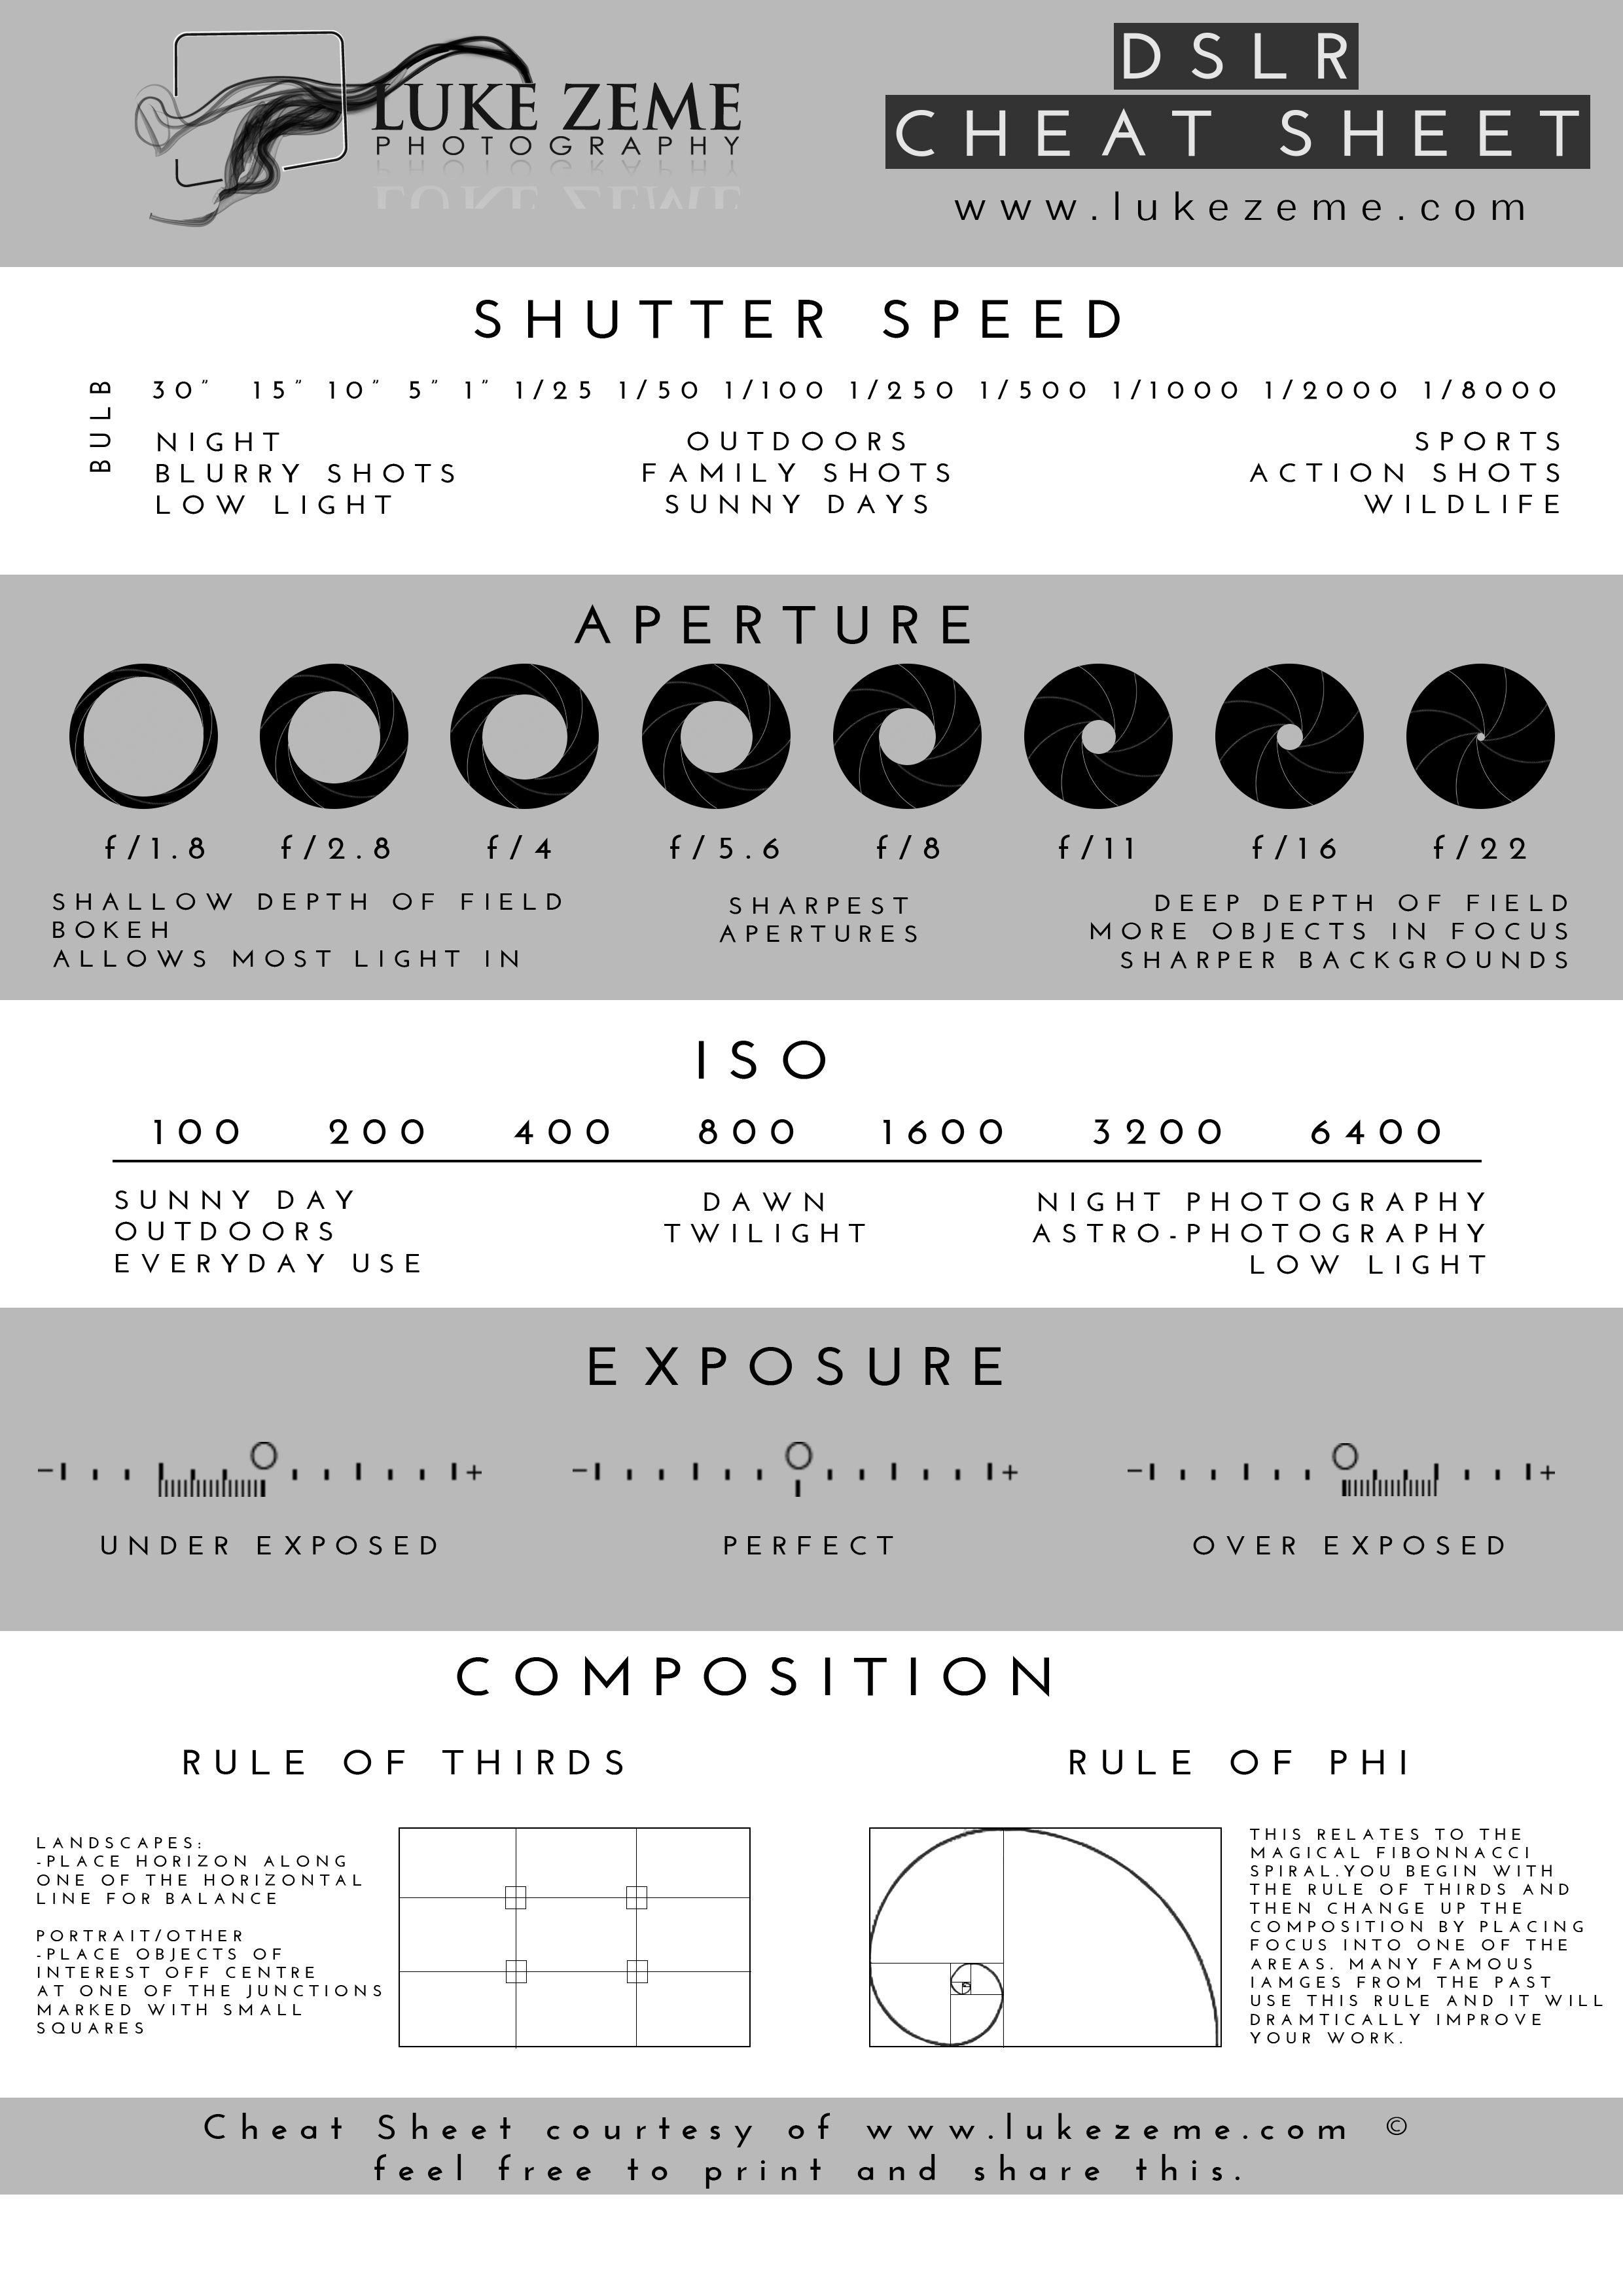 FREE Cheat Sheet, DSLR Manual Photography | Photography ...